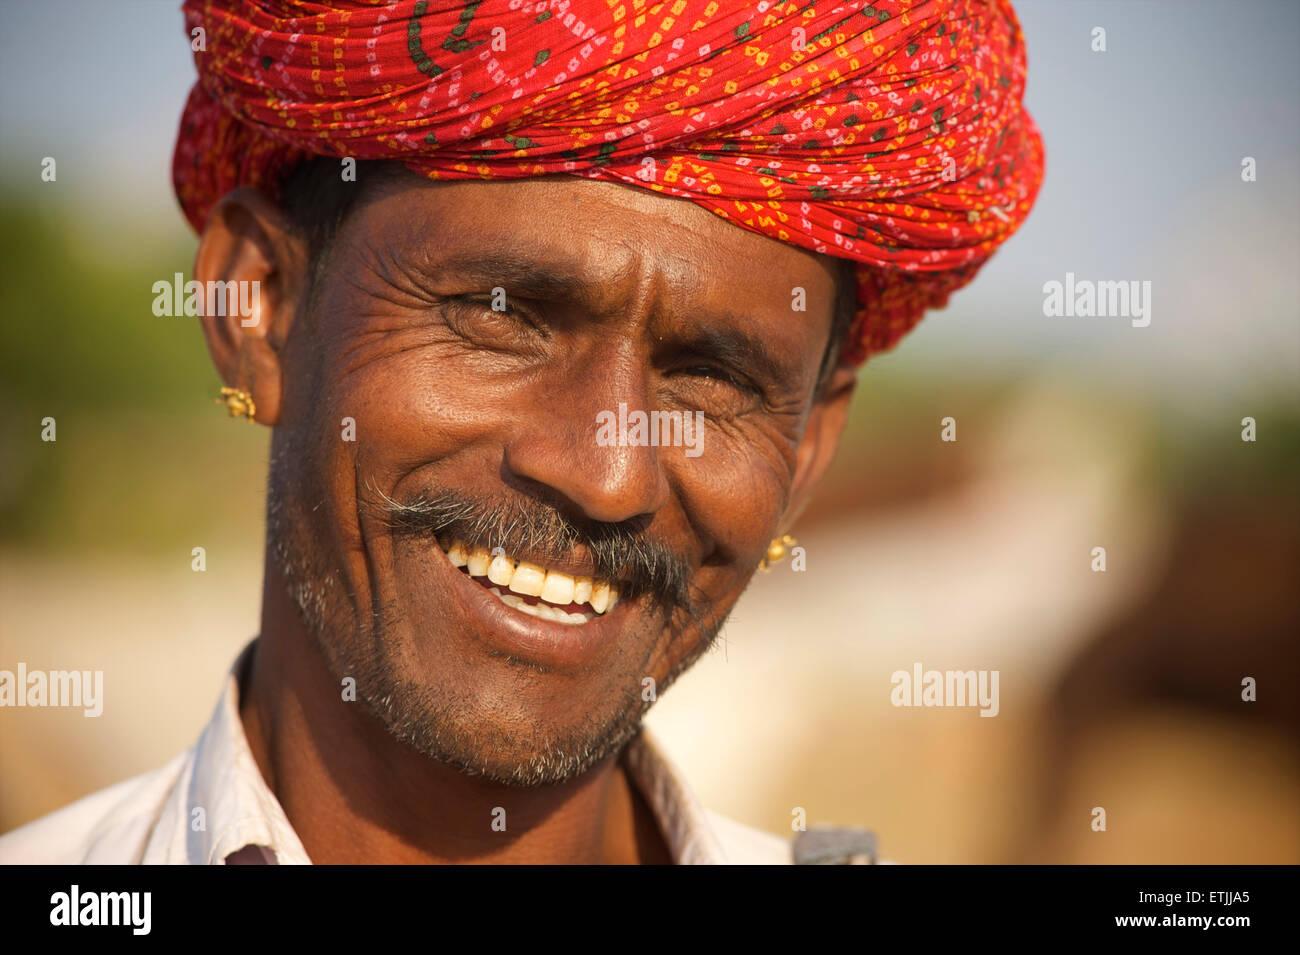 Rajasthani uomo con turbante colorato, Pushkar, Rajasthan, India Immagini Stock